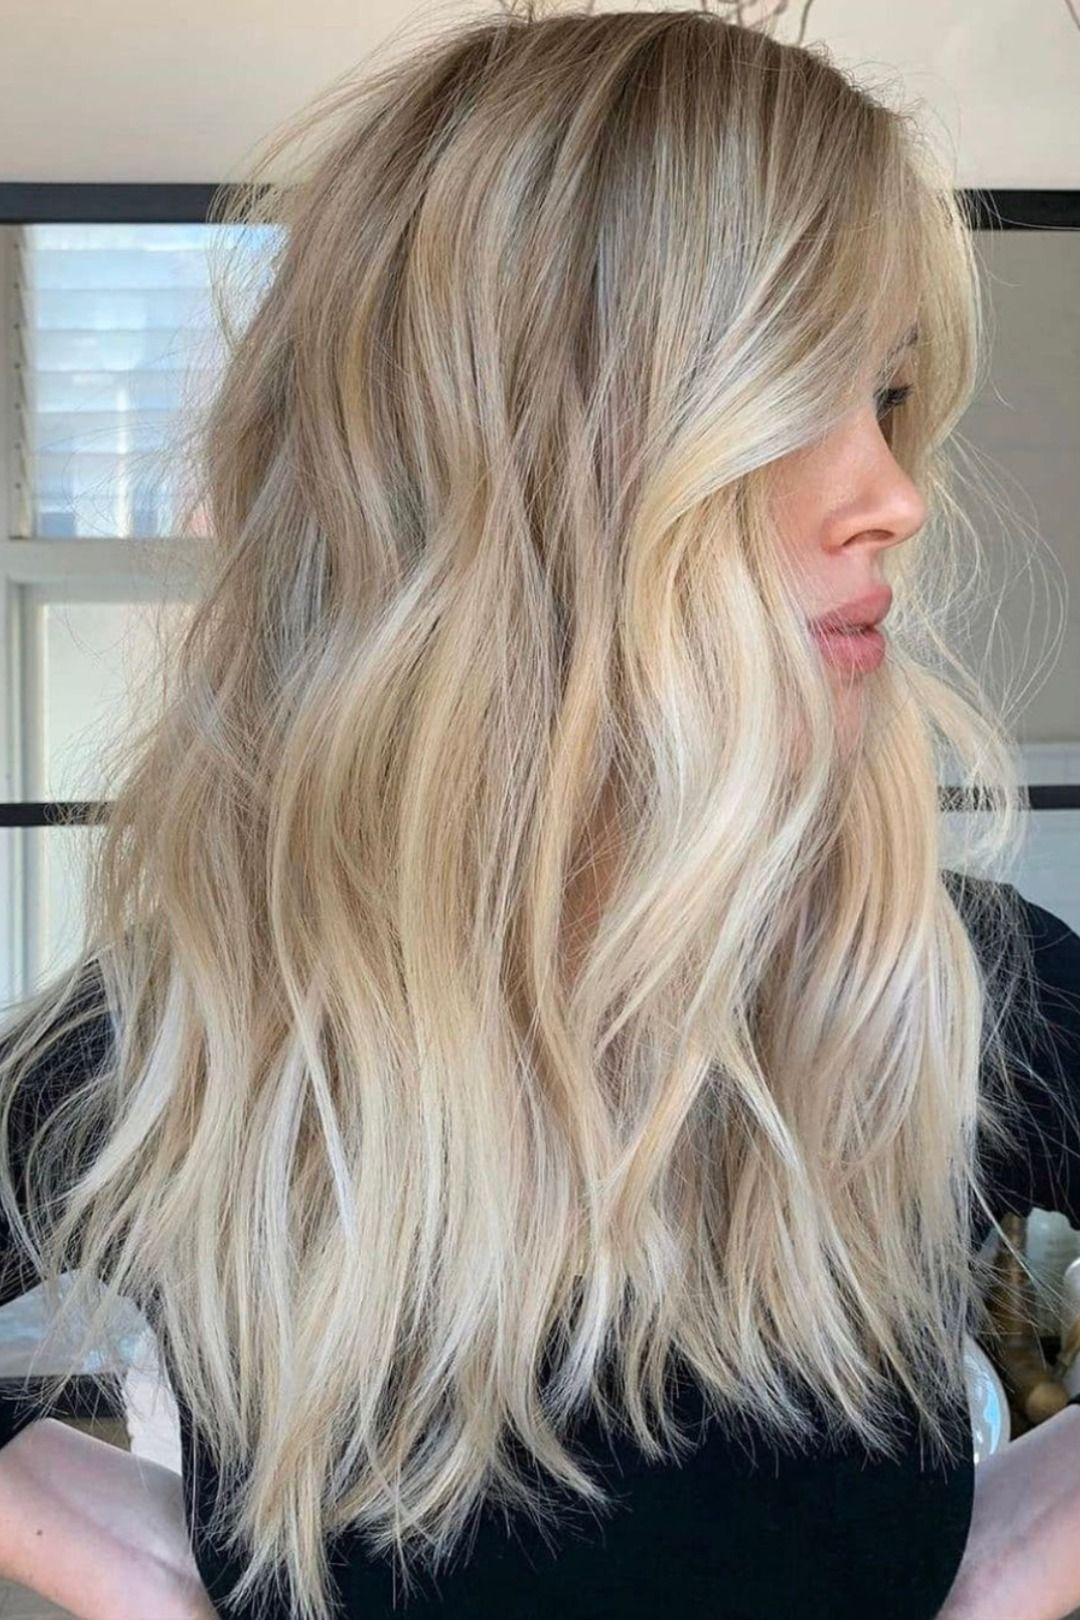 Dreamy Wavy Sandy Blonde Balayage Hair by @_edward